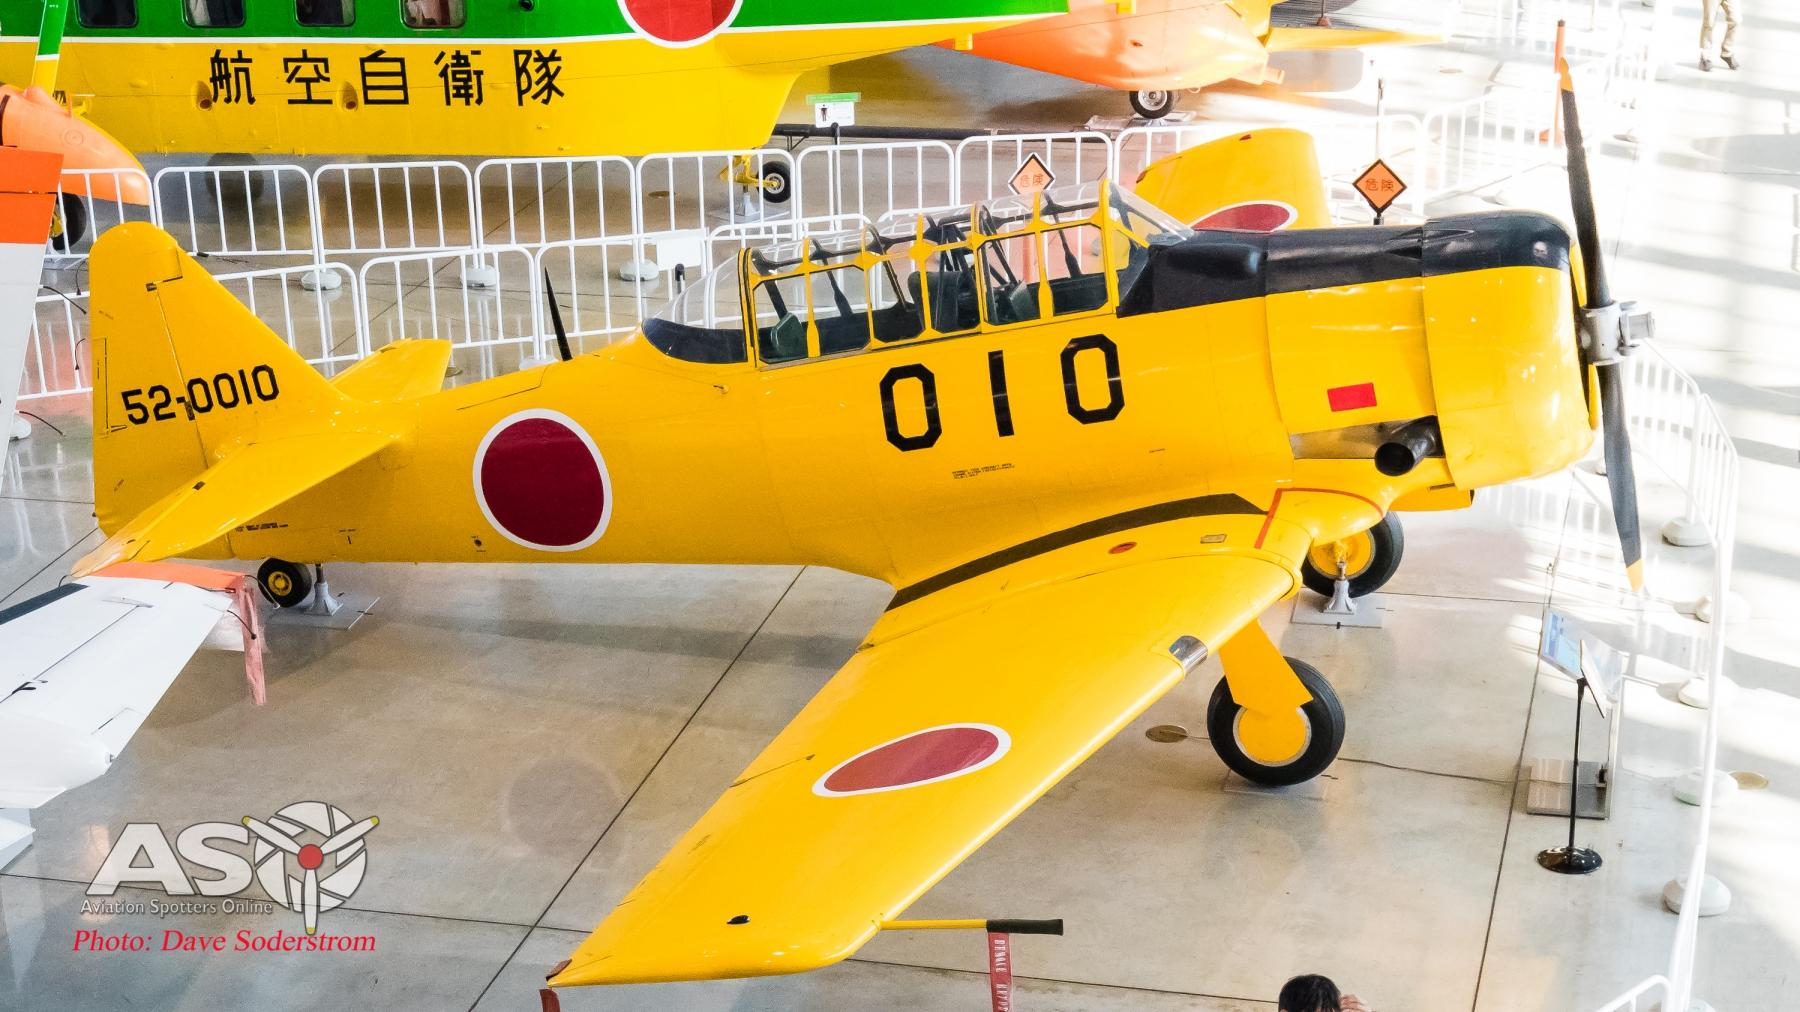 JASDF-Museum-2018-36-1-of-1